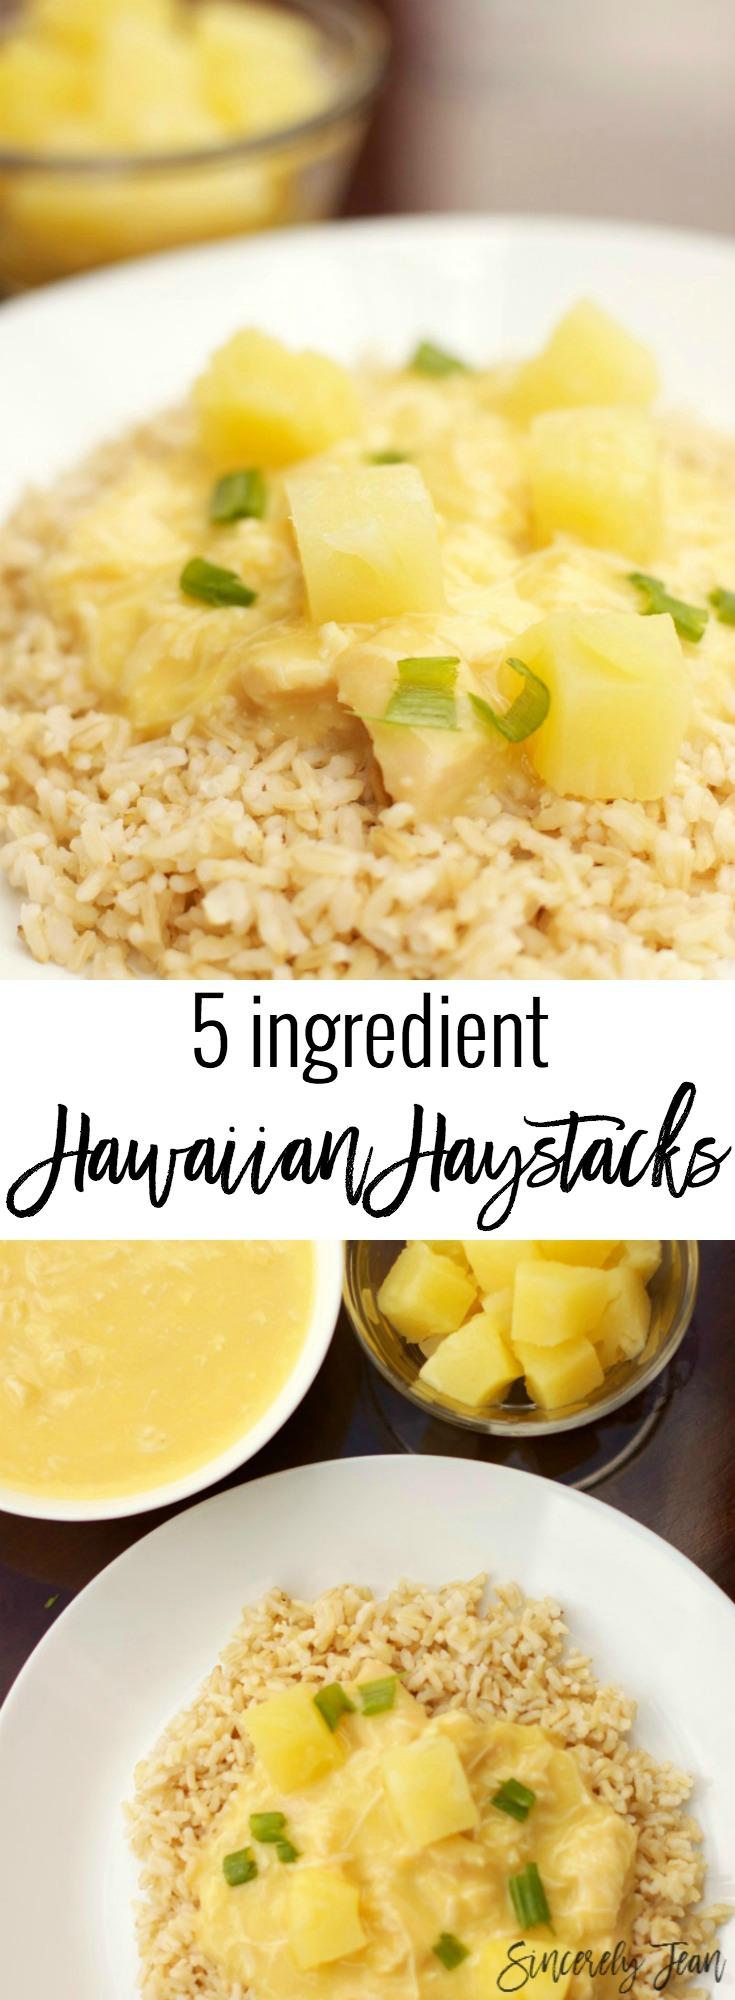 Simple dinners: Five ingredient Hawaiian Haystacks by SincerelyJean.com